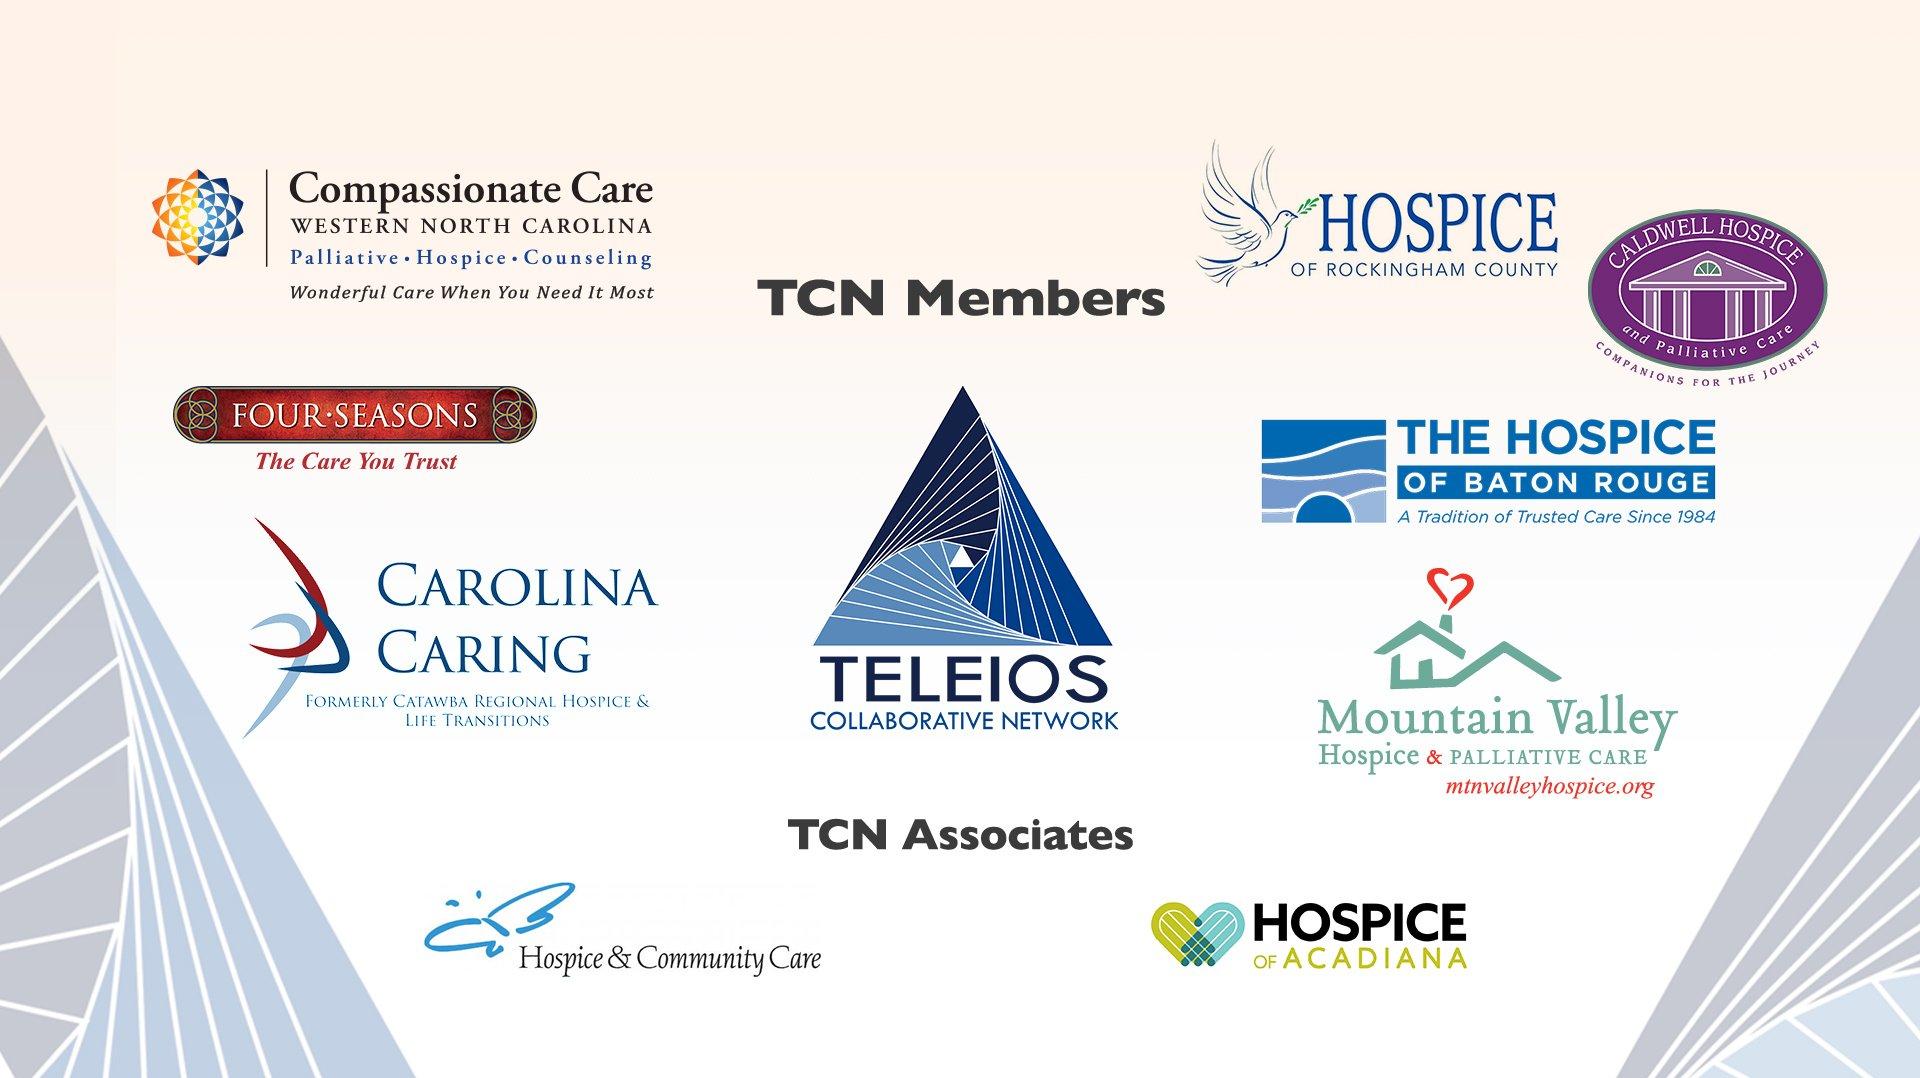 TCN Members and Associates